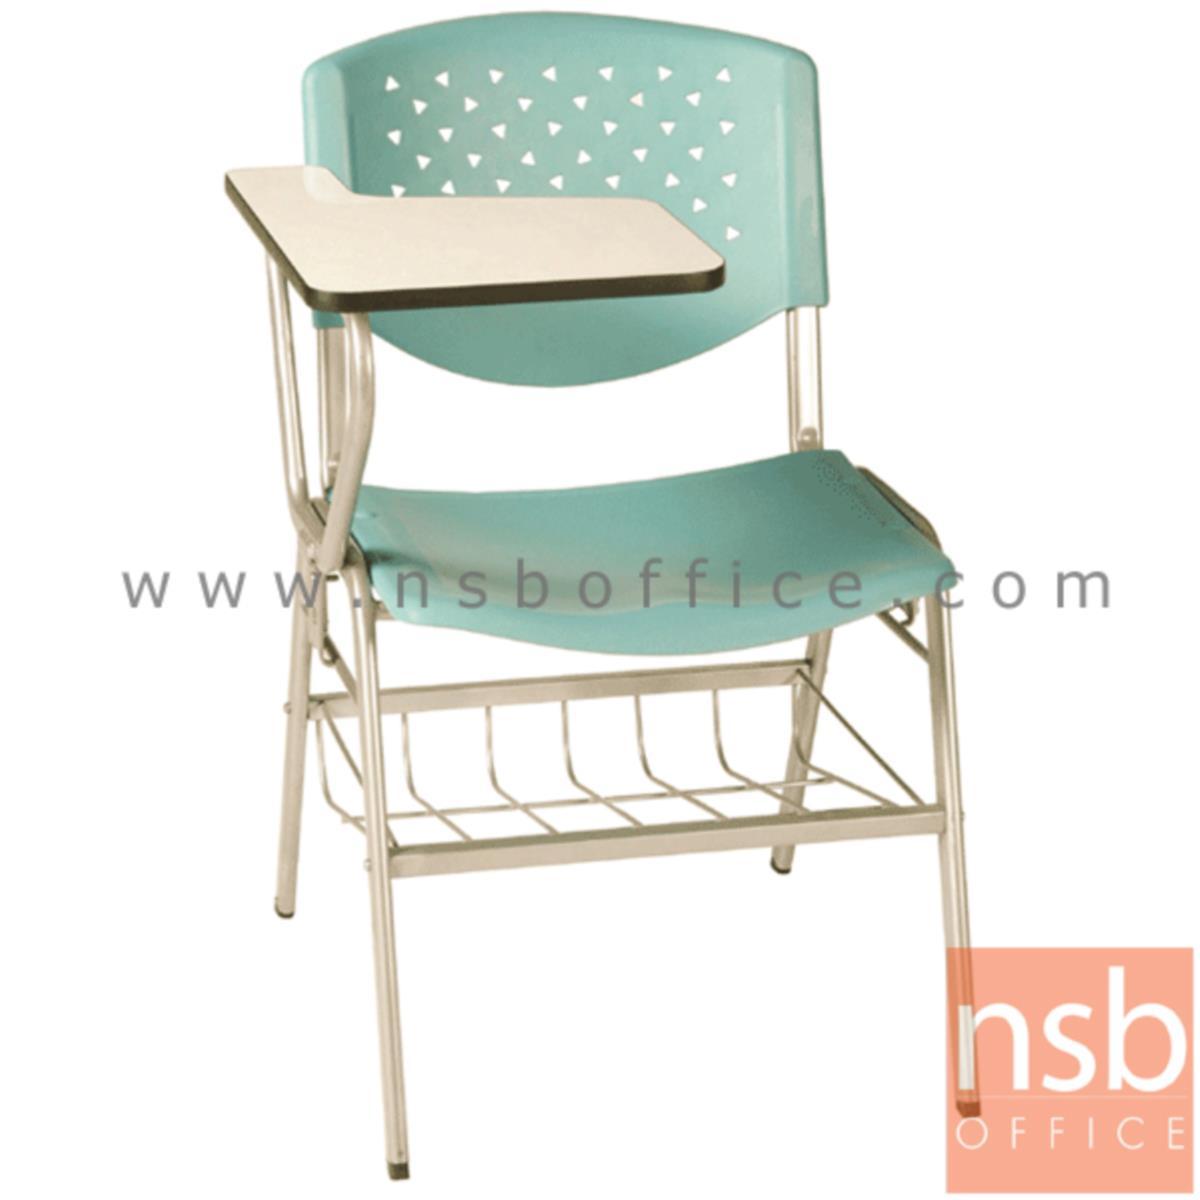 B07A051:เก้าอี้เลคเชอร์เฟรมโพลี่ รุ่น C536-826 (มีตะแกรงวางของ) ขาเหล็กพ่นสี